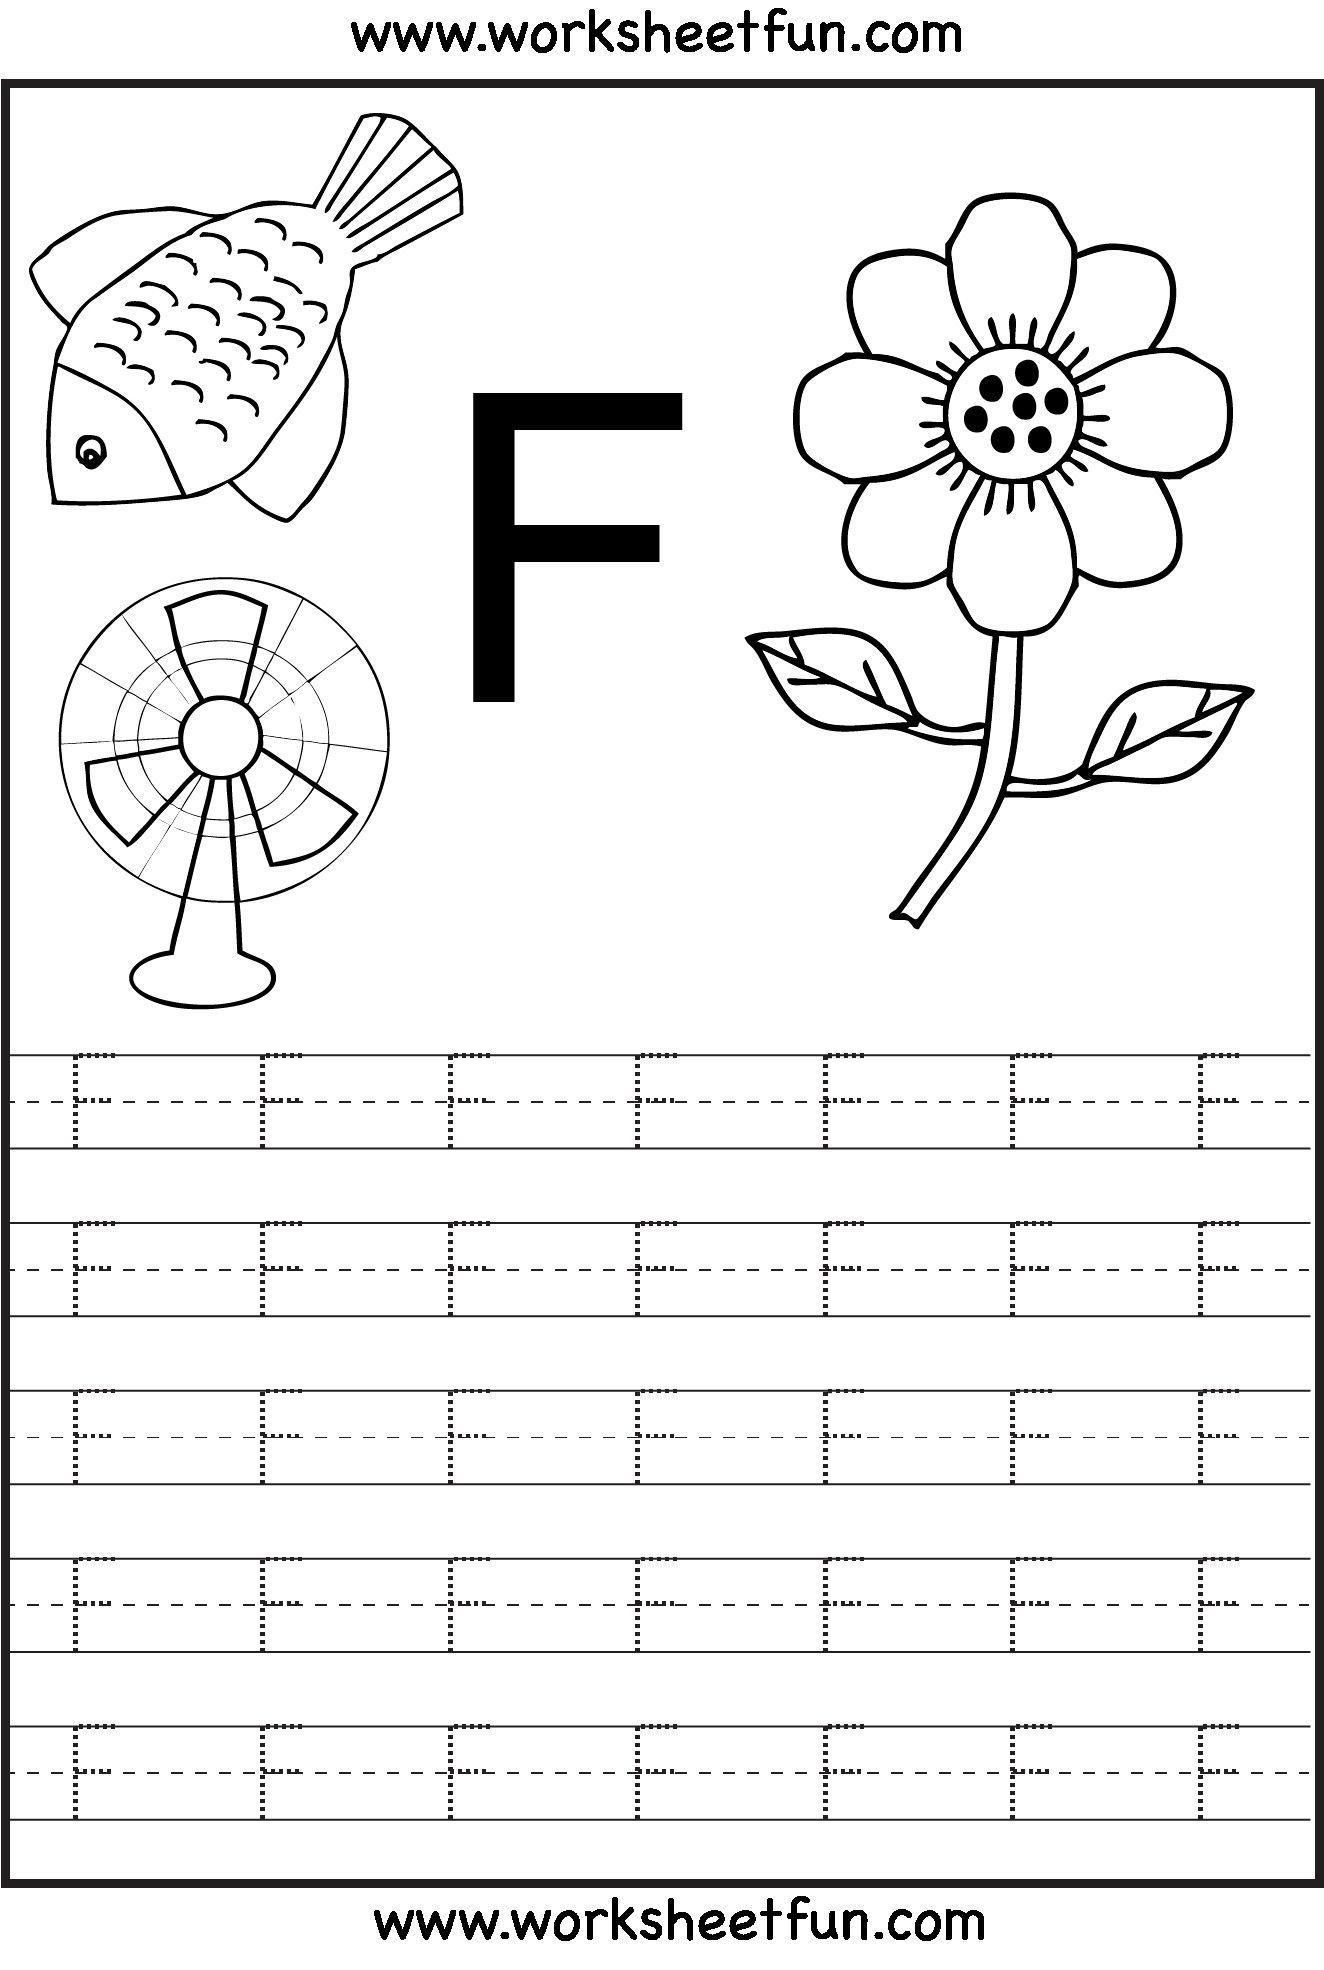 3 B Cursive Worksheets Printable Capital Letter D Coloring Pages Maze Inside Cursive W Alphabet Writing Worksheets Letter Tracing Worksheets Writing Worksheets [ 1970 x 1324 Pixel ]